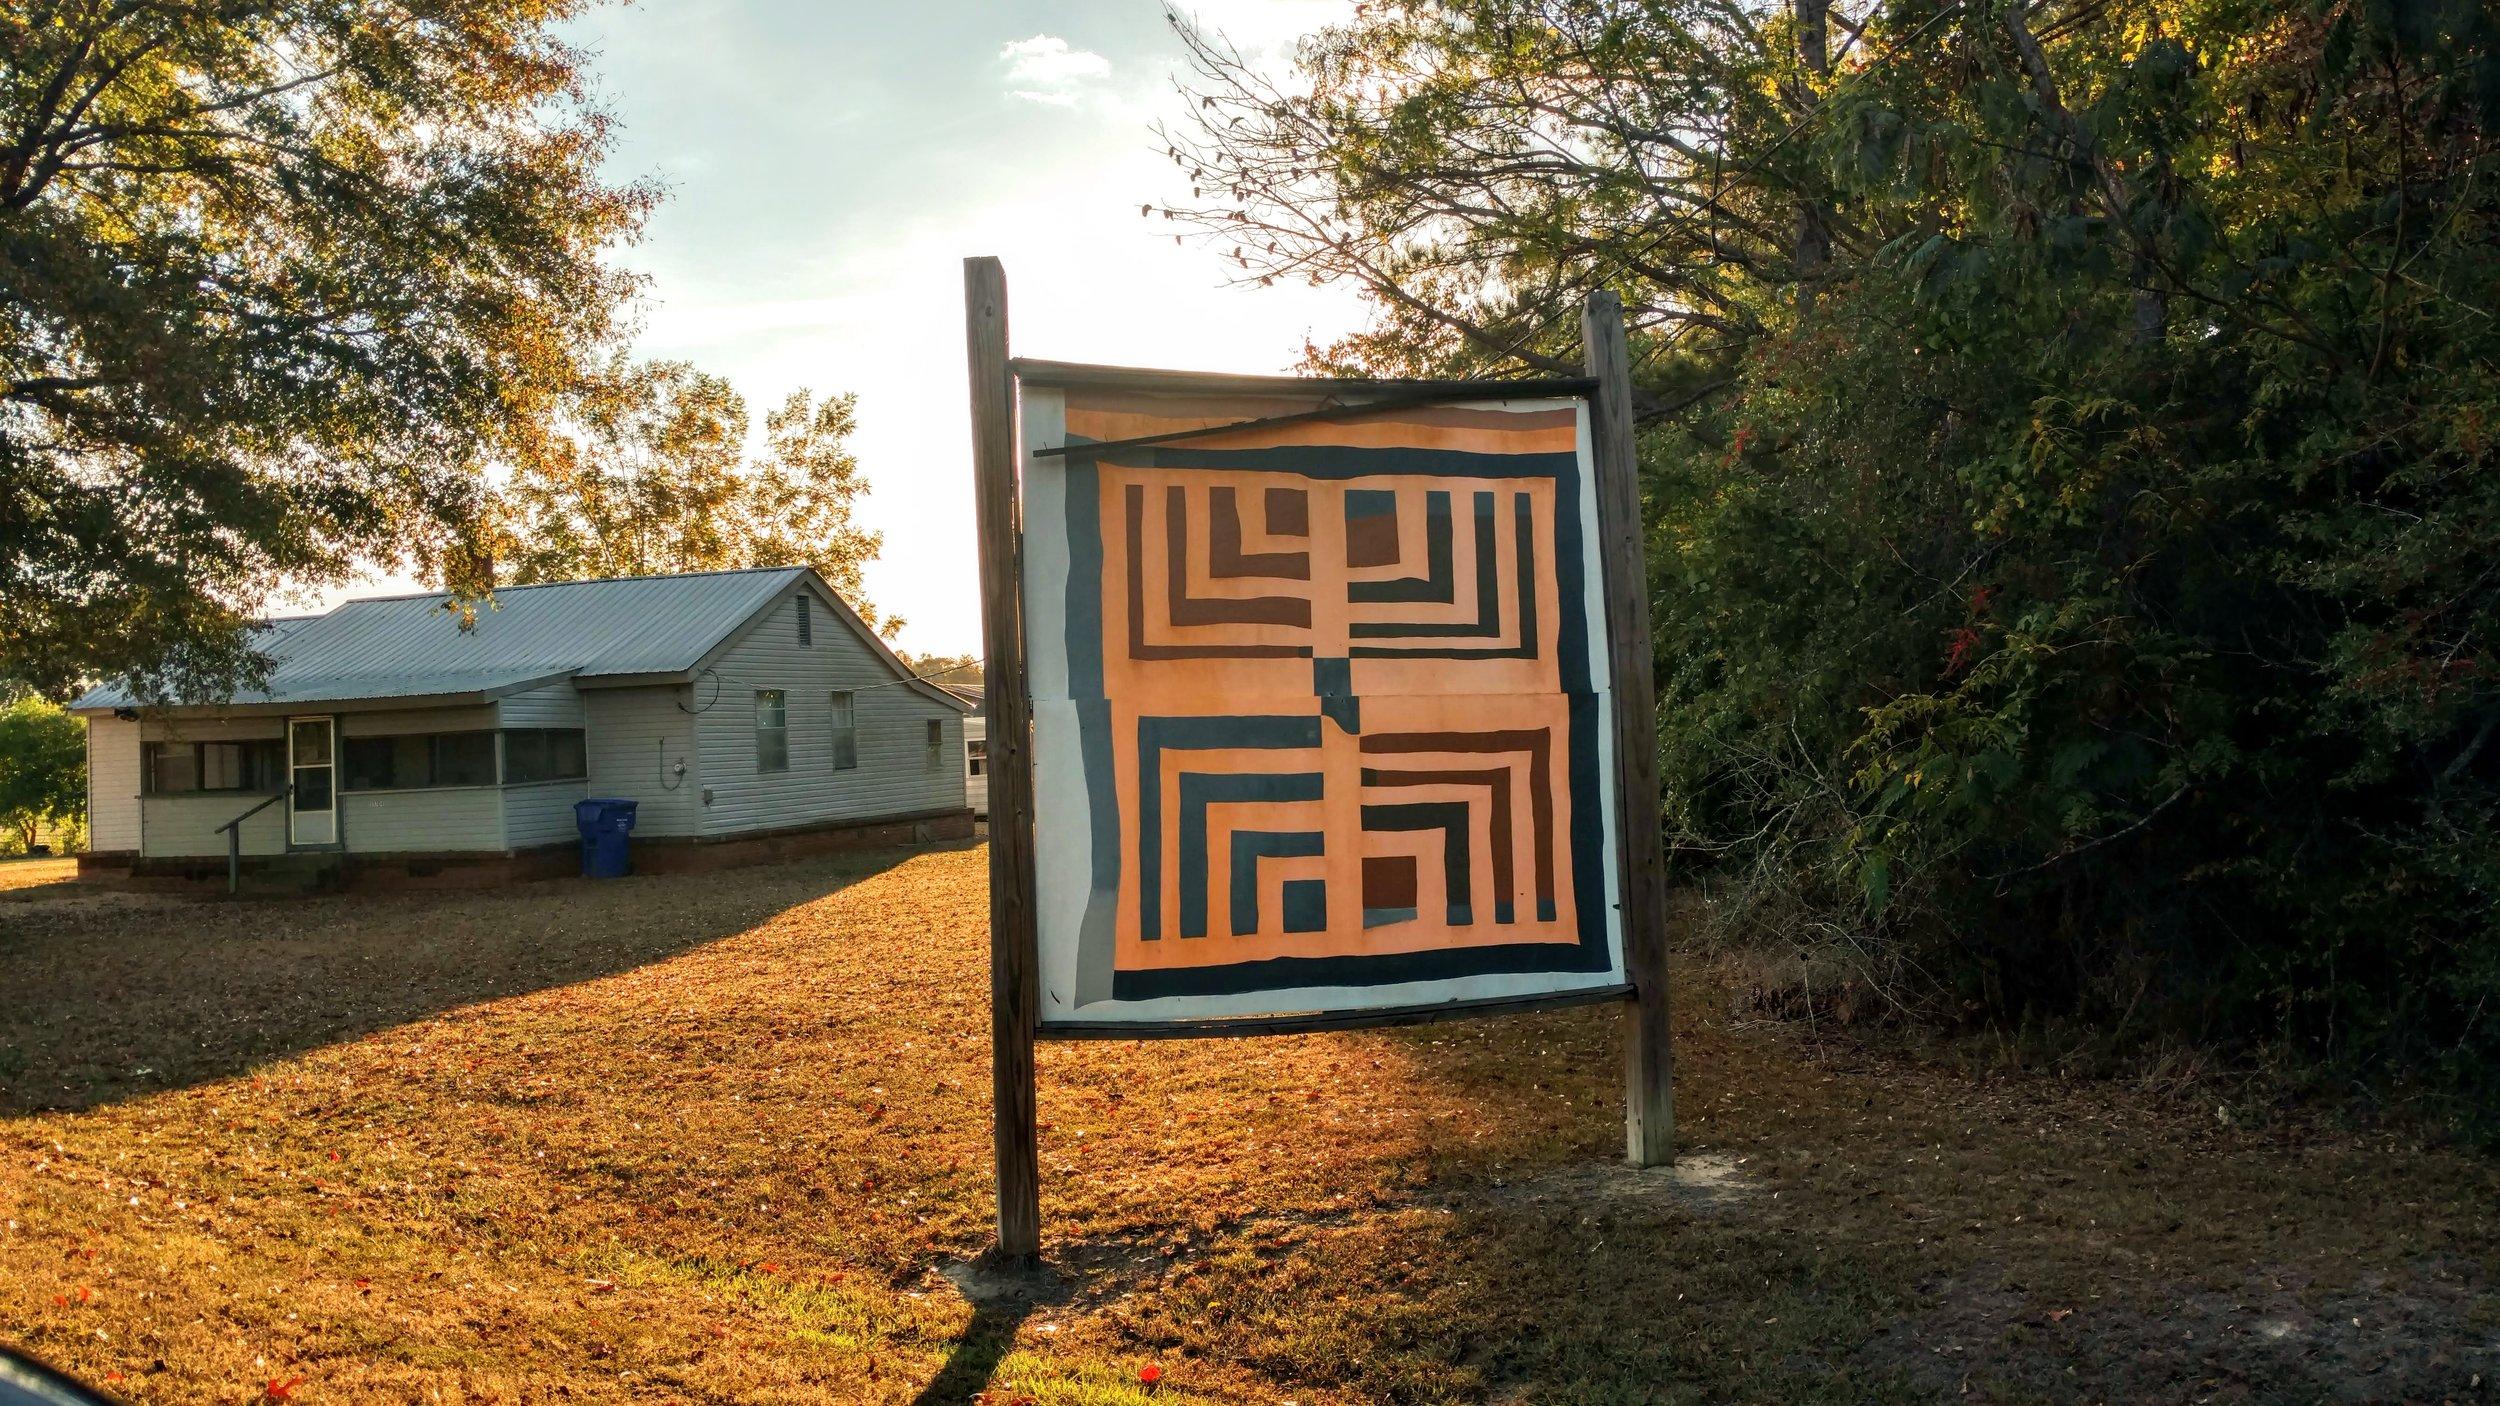 House-top-four-block/Half Log Cabin  by Lottie Mooney, 2016, copyright Stuart Moores Textiles